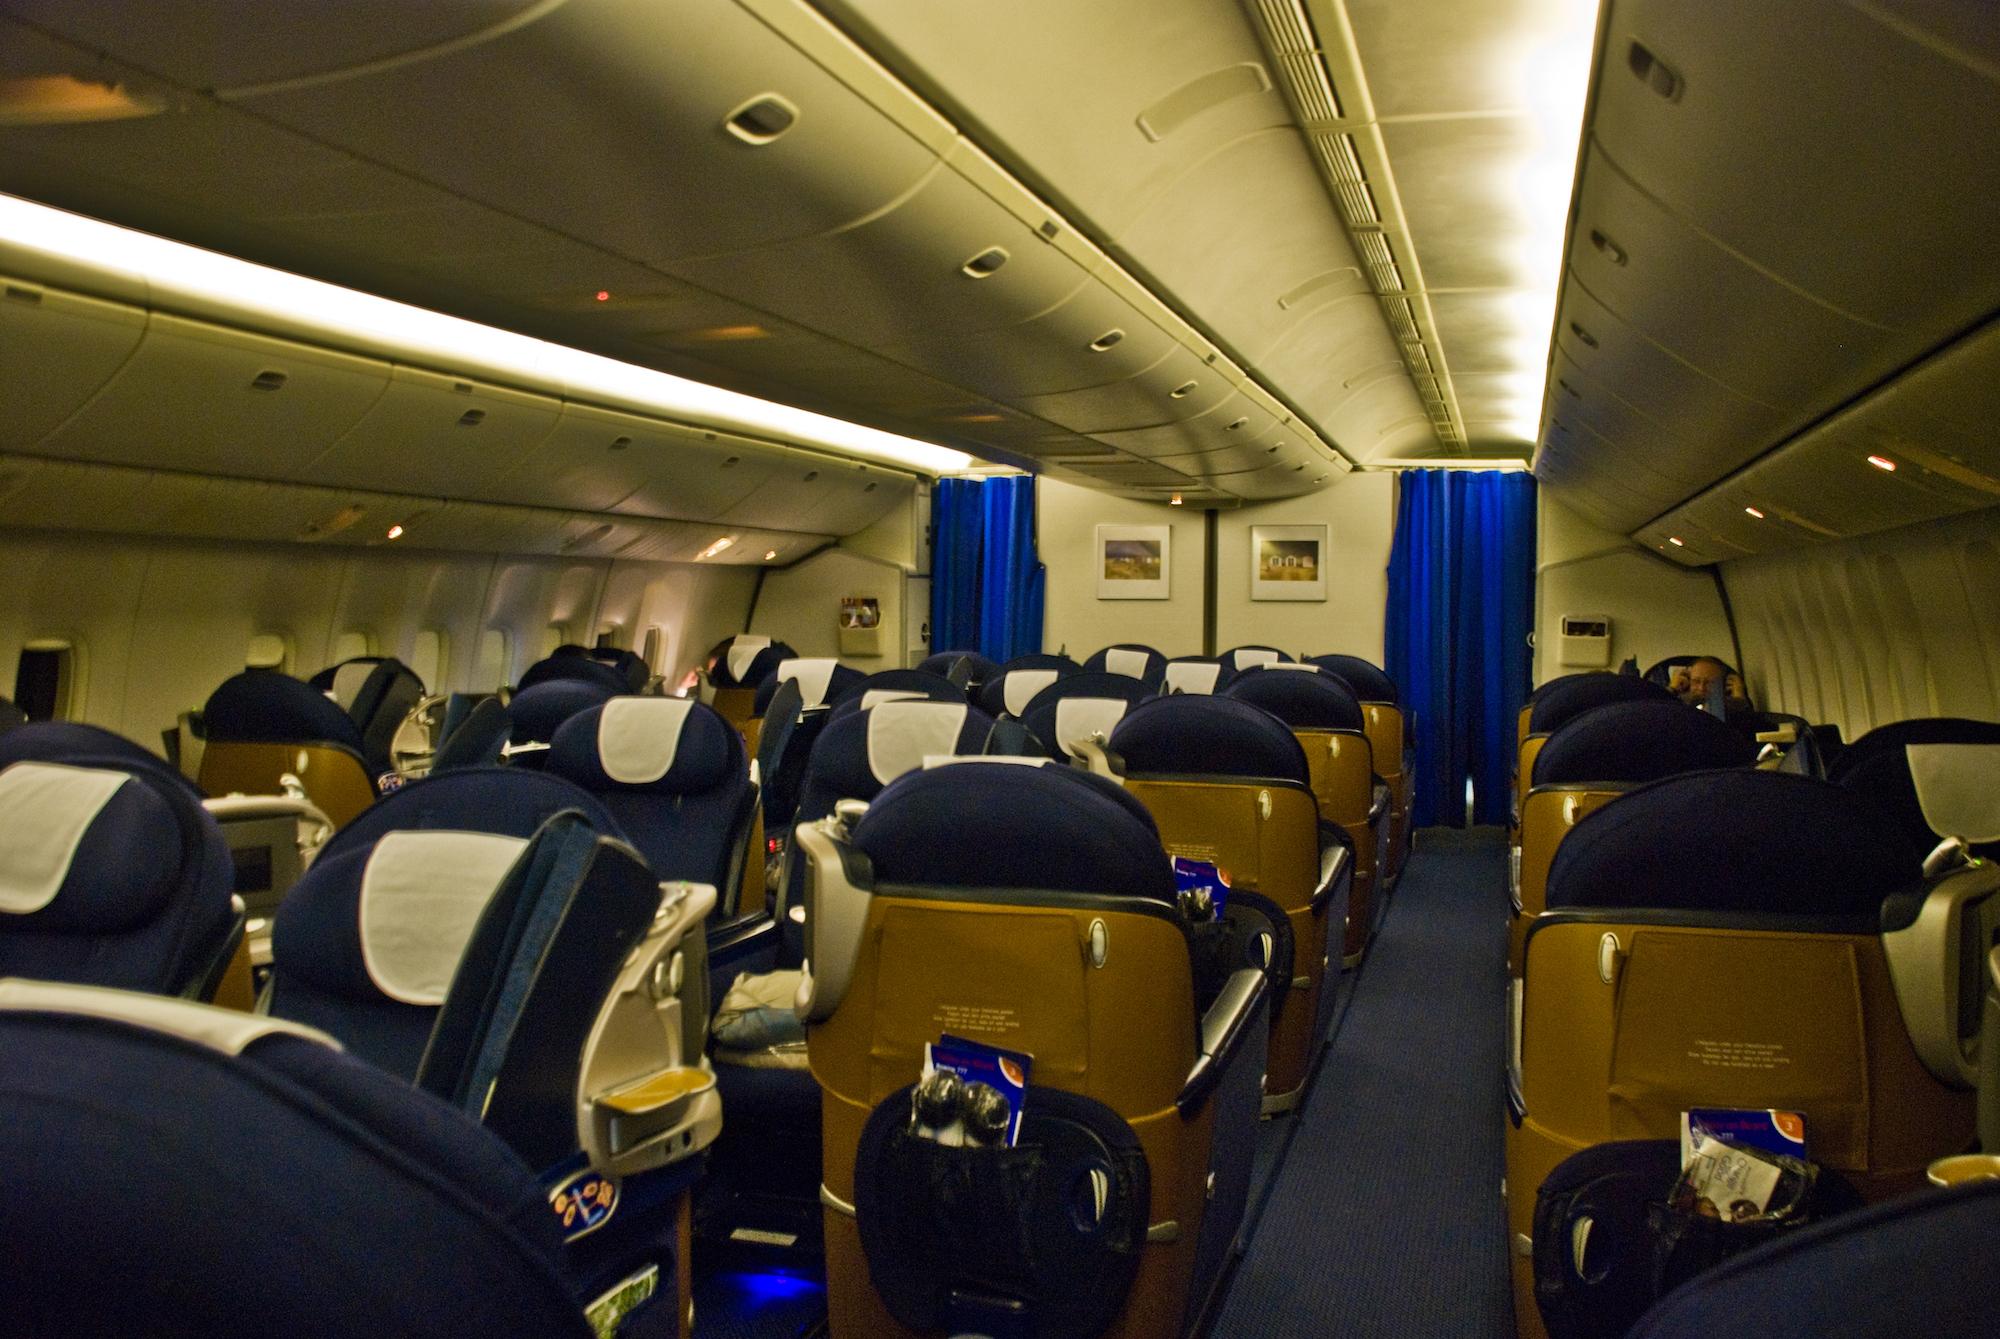 BA reveals new Business Class 'Club Suite', but when is it